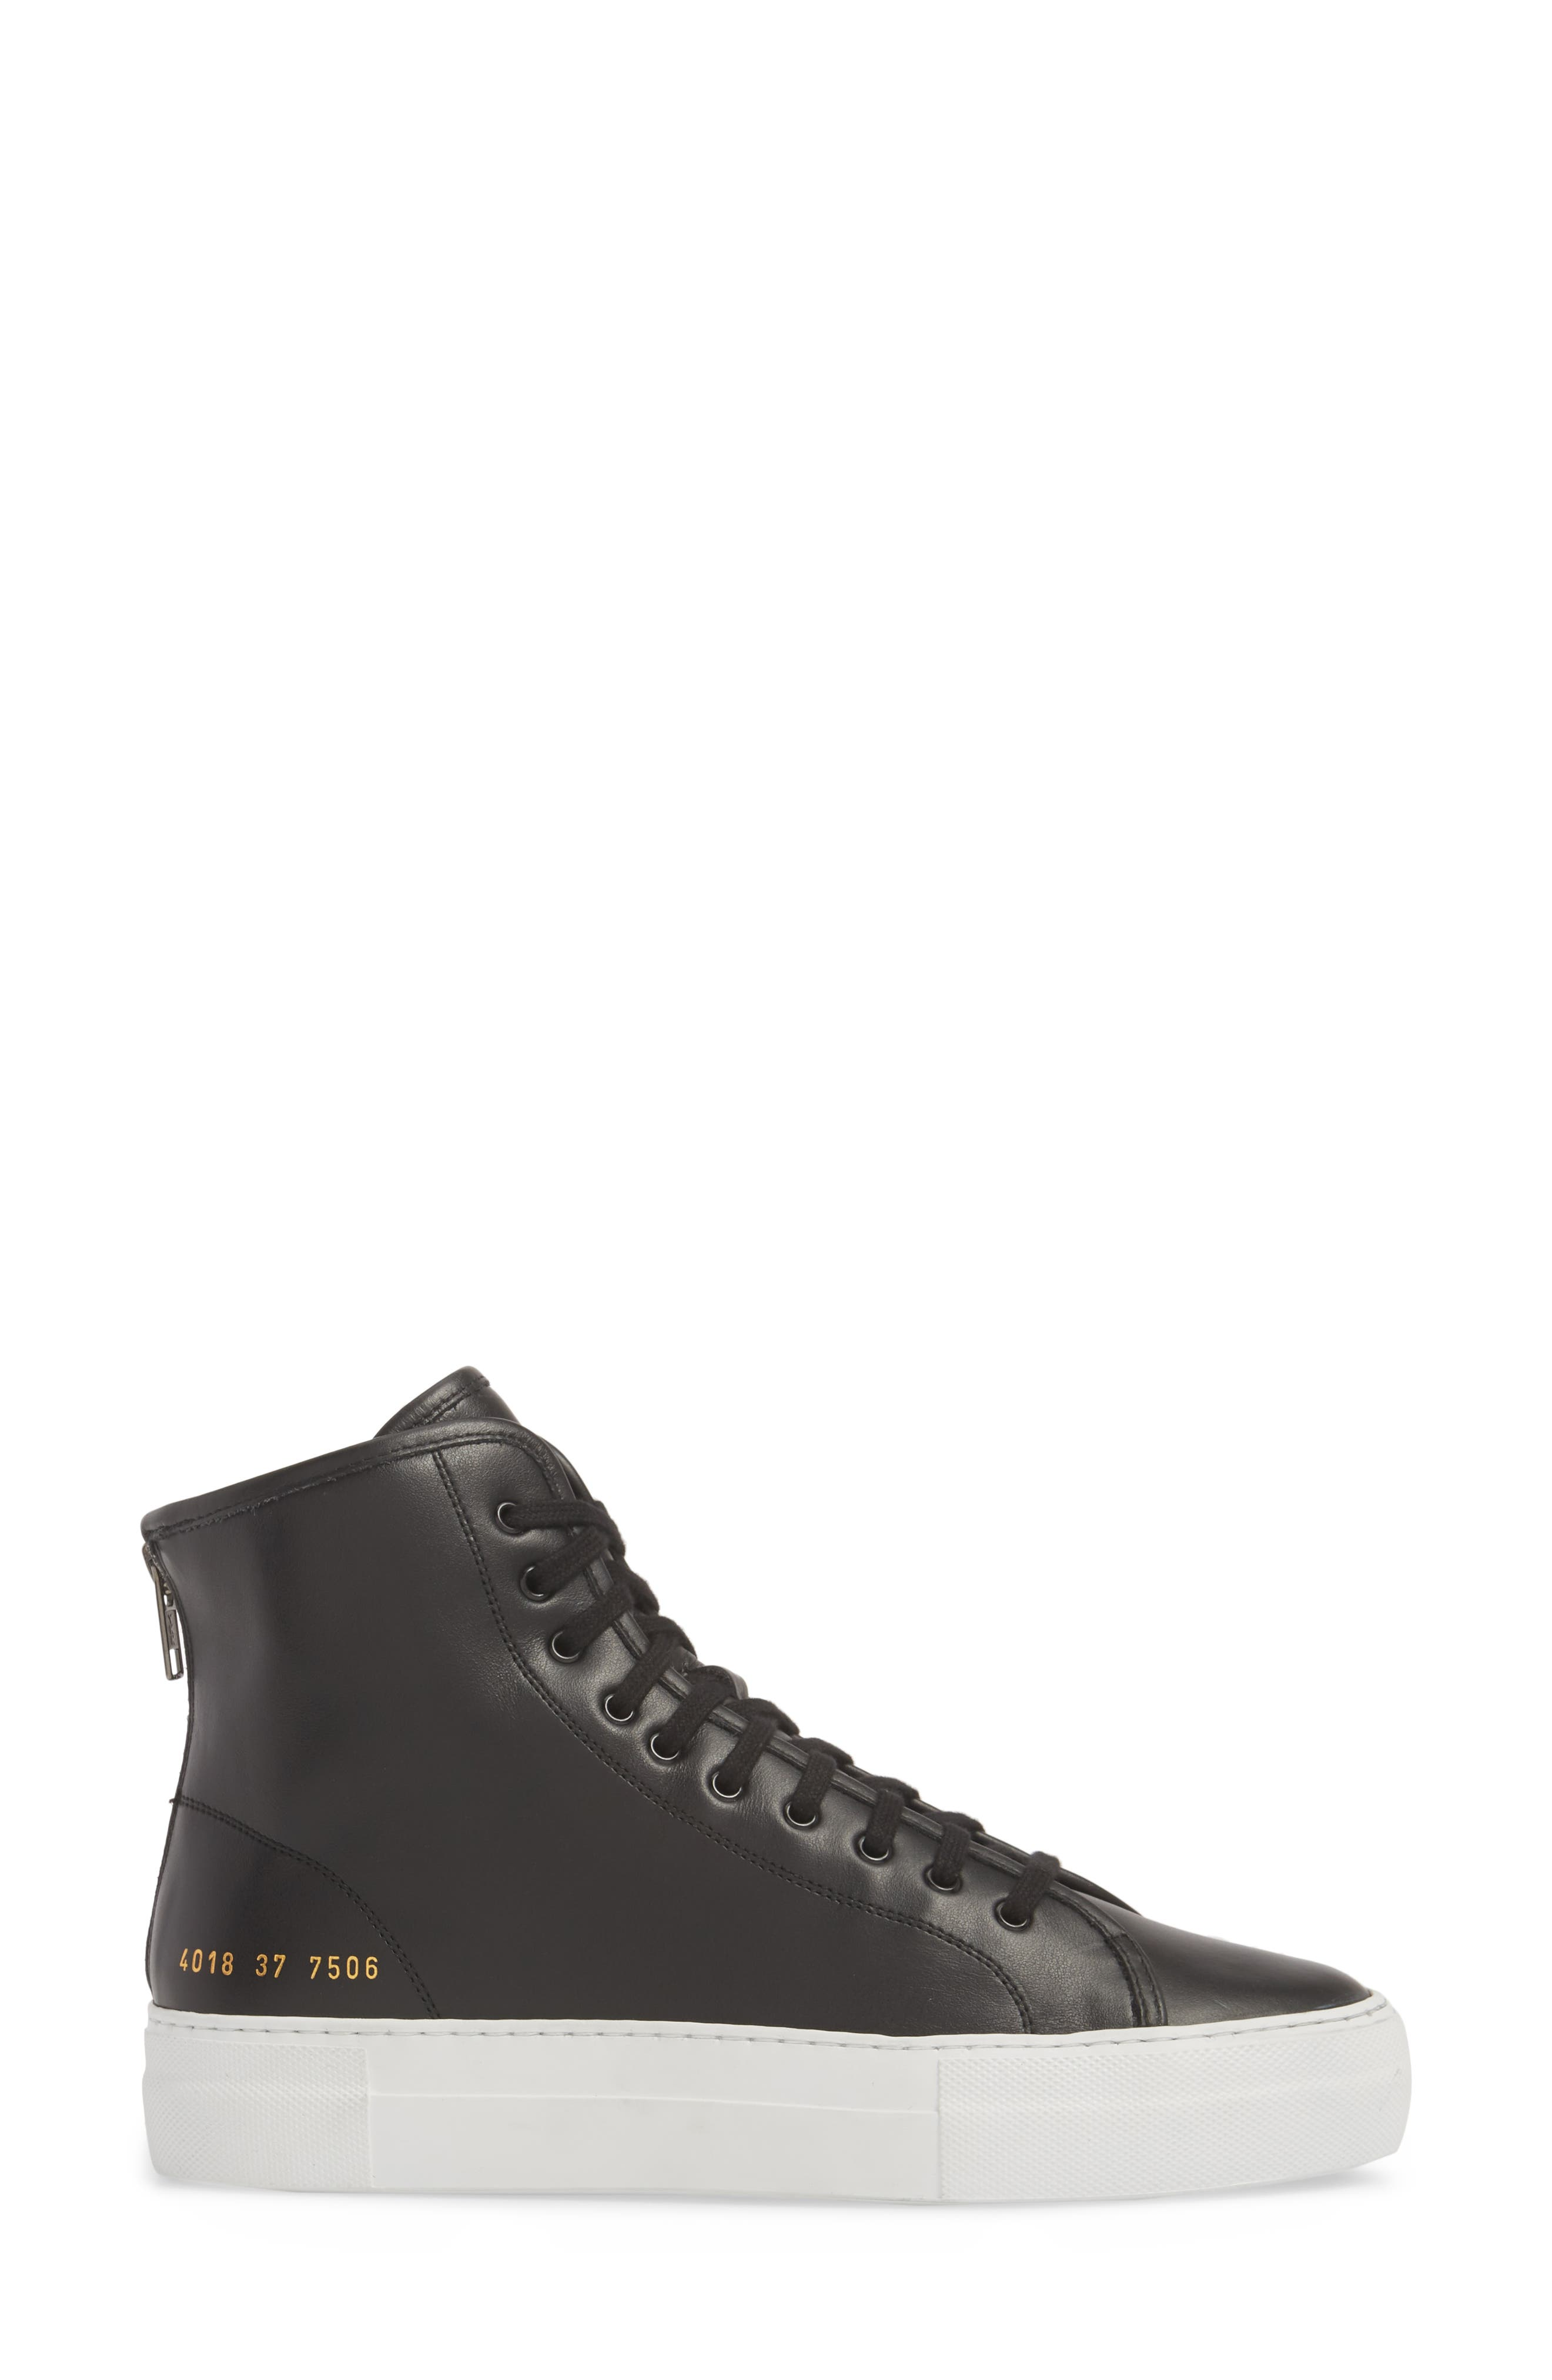 COMMON PROJECTS, Tournament High Super Sneaker, Alternate thumbnail 3, color, BLACK/ WHITE